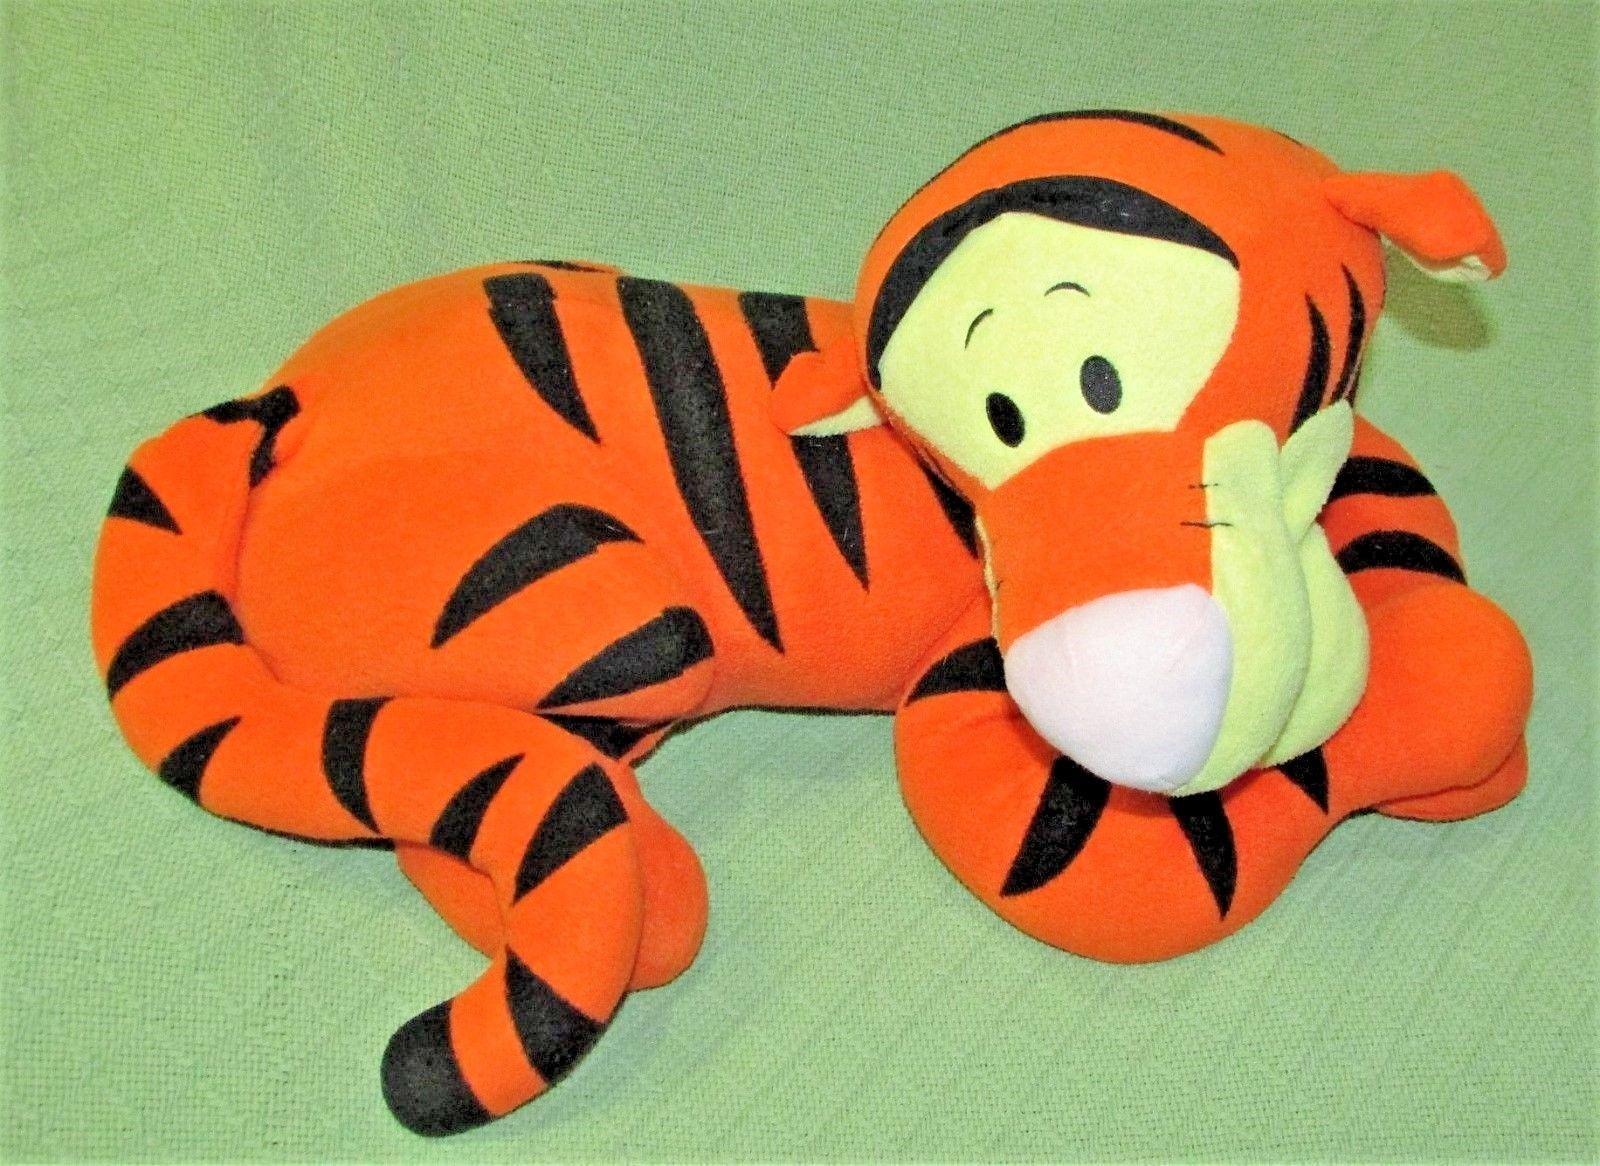 "Disney LOUNGING TIGGER 22"" Stuffed Animal PILLOW Plush Winnie Pooh Friends Jumbo"